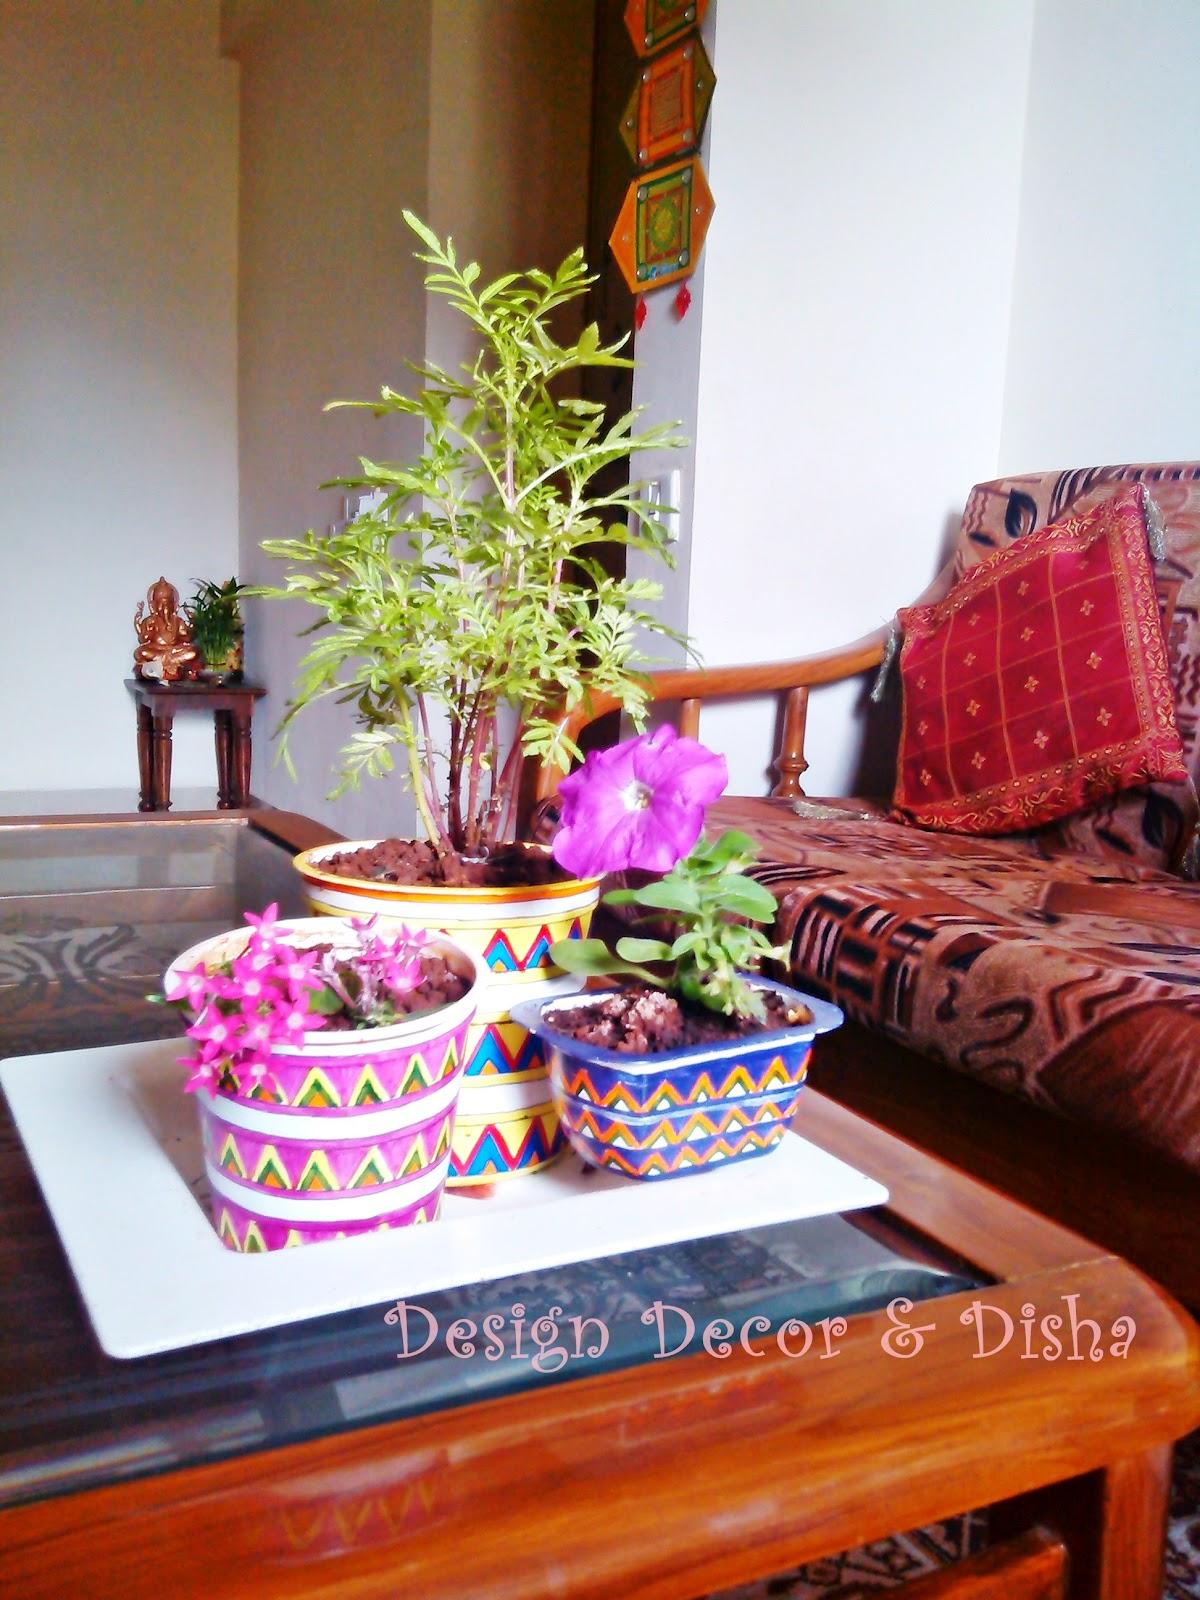 Design Decor Disha An Indian Design Decor Blog Pop